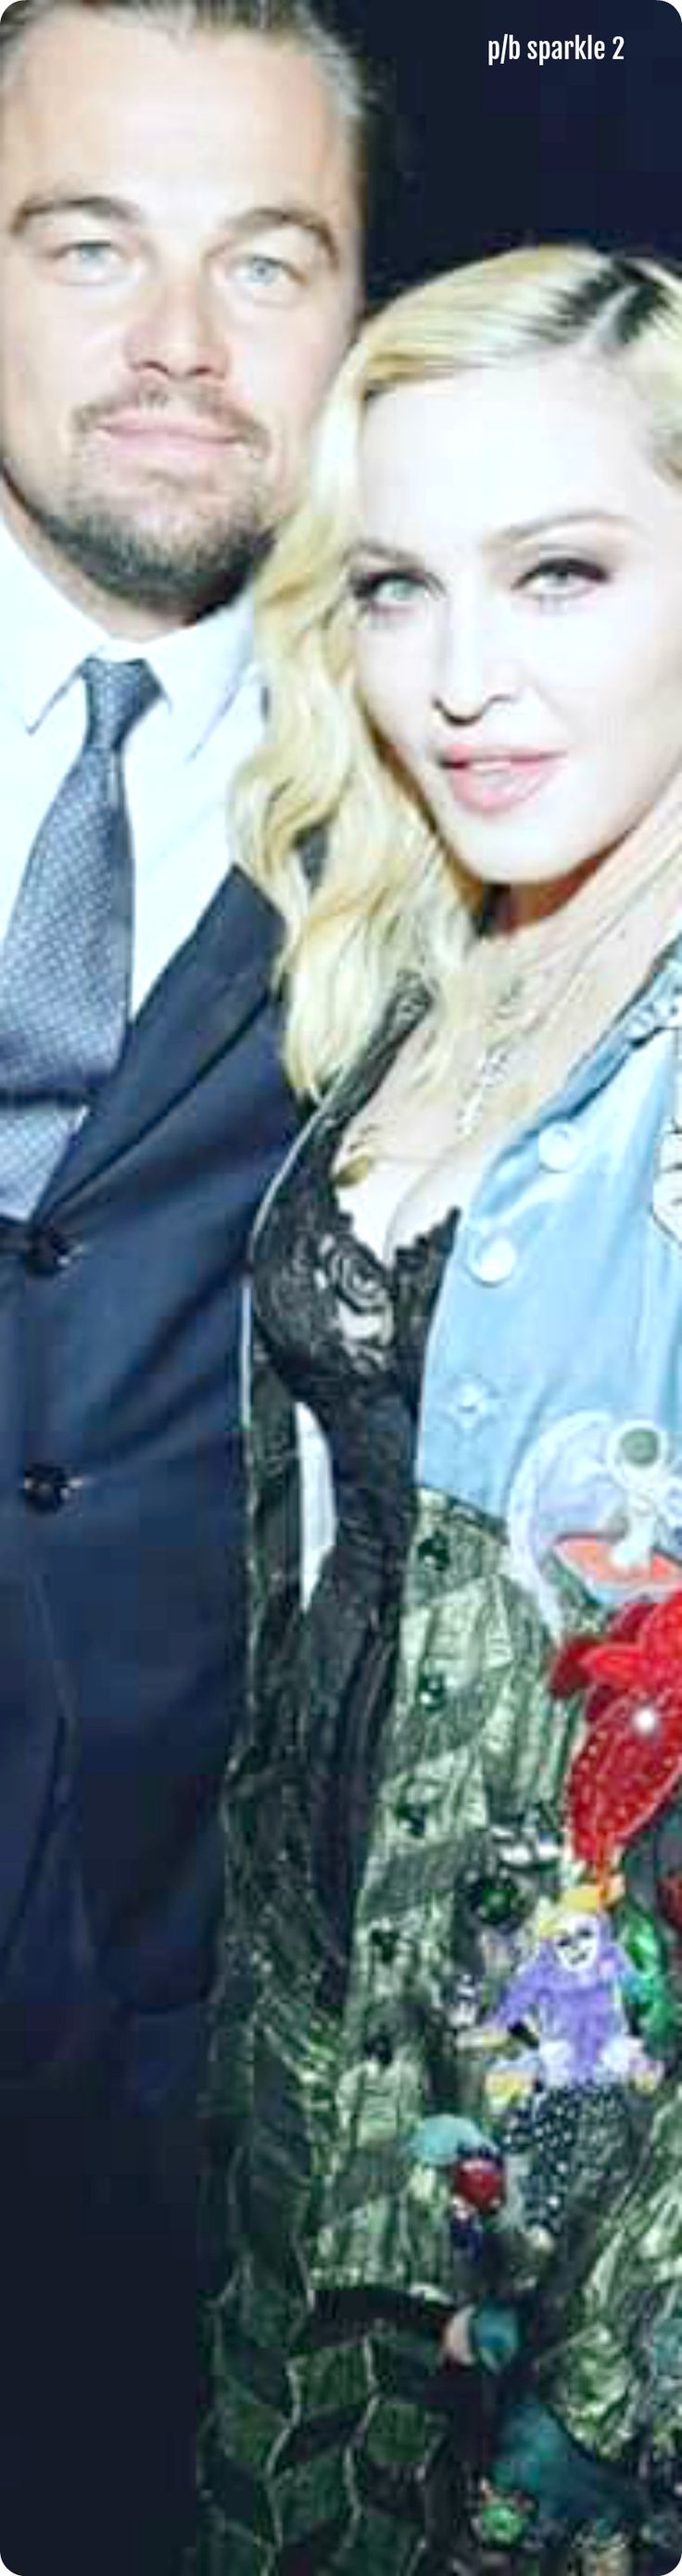 Leonardo DiCaprio and Madonna at the Leonardo DiCaprio Foundation gala extravaganza in St. Tropez, France, July 2017